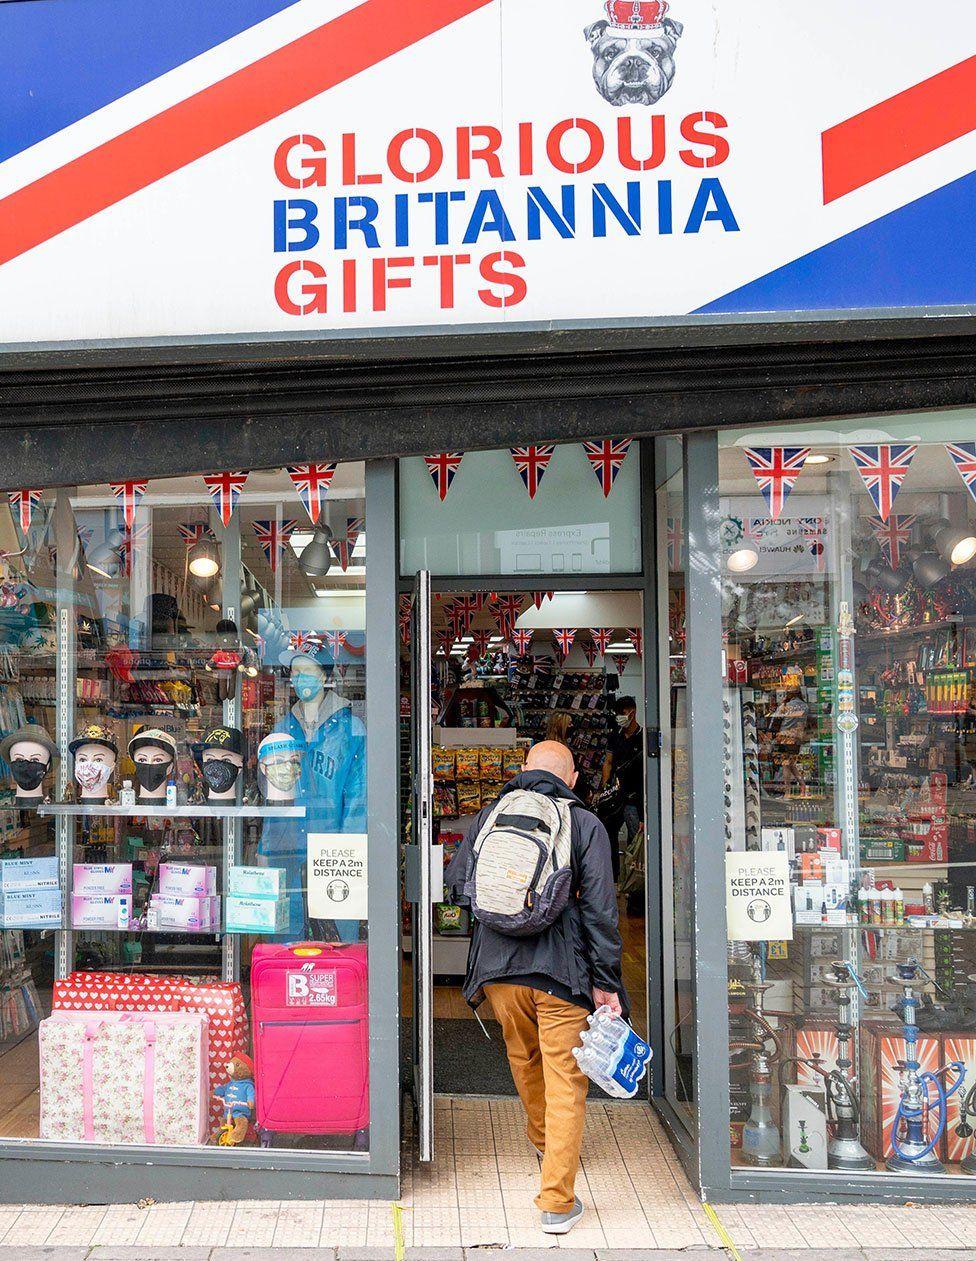 A customer enters a gift shop